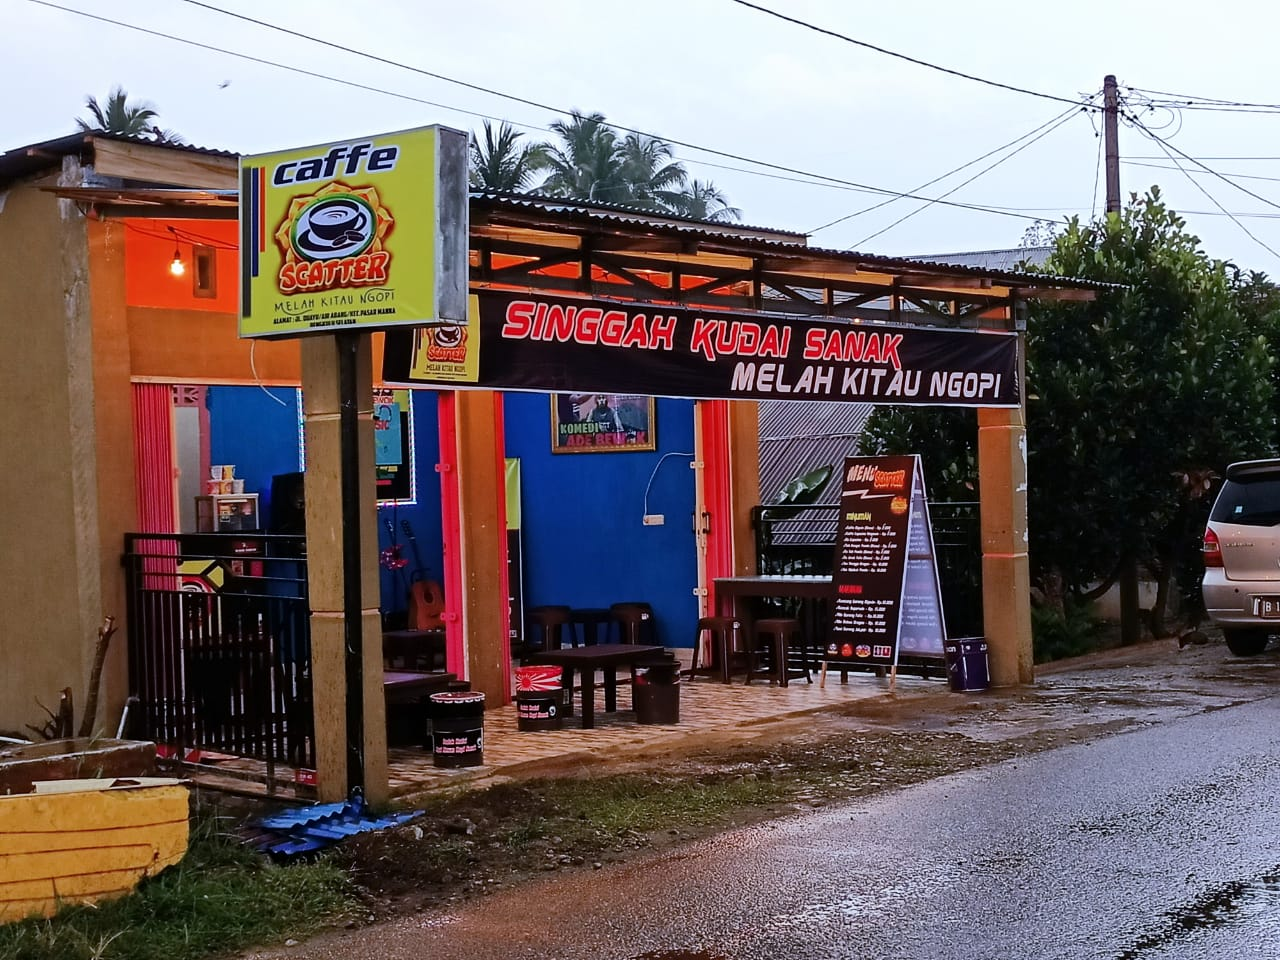 Mampir Yuk! Ada Kafe Bernuansa Higgs Domino Island di Kota Manna